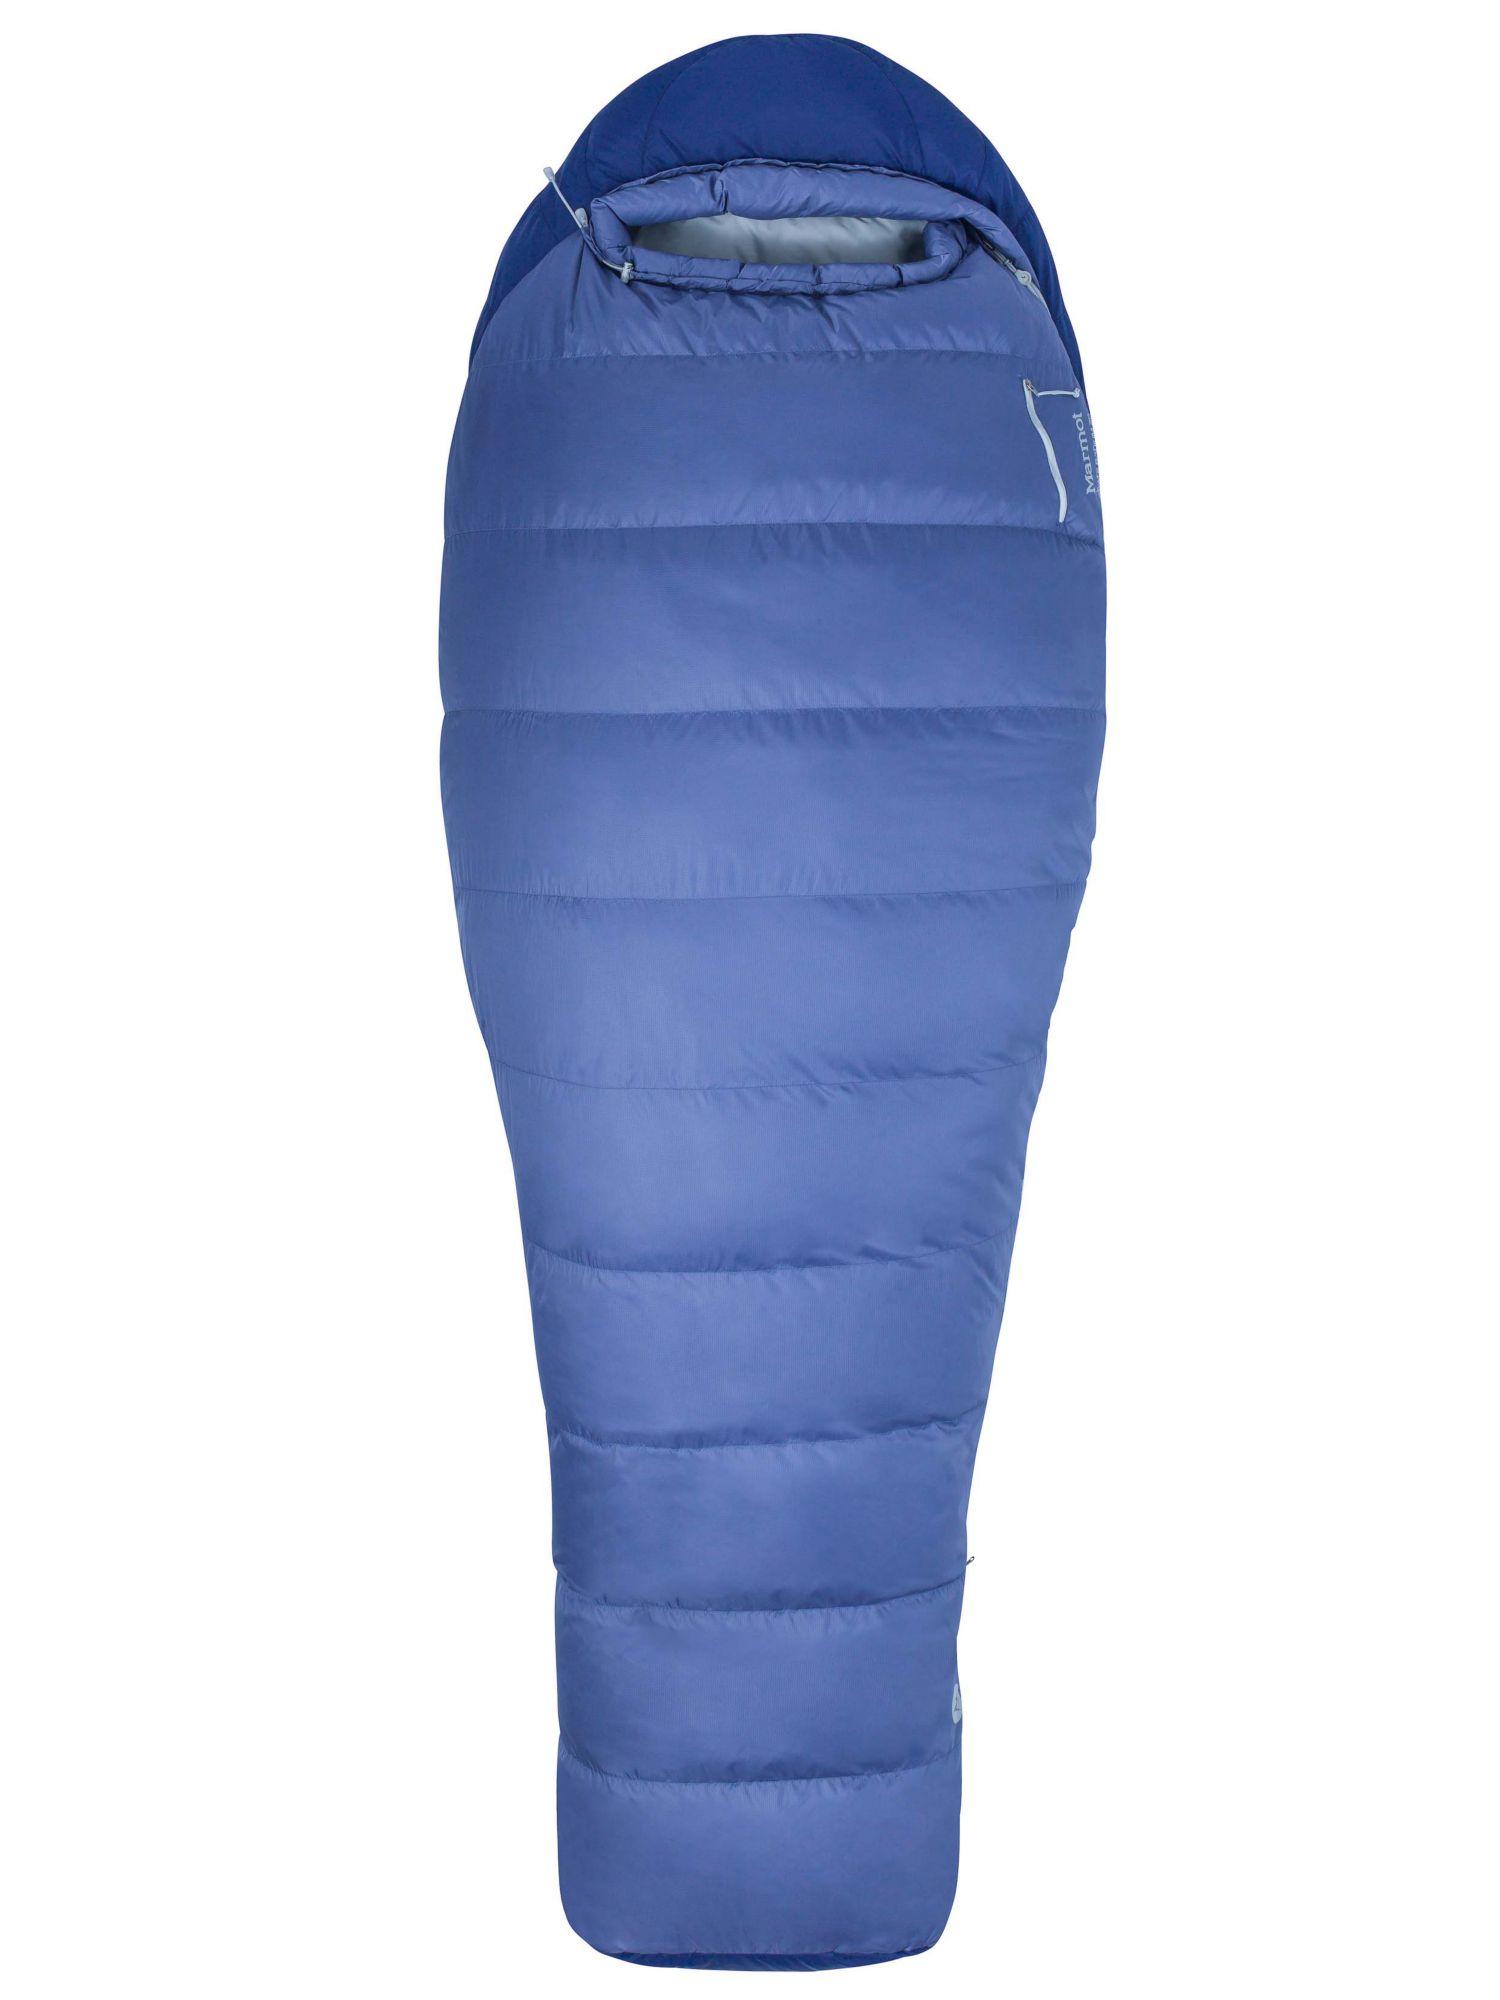 Marmot Womens Wms Trestles 15 Mummy 183 cm//Right Zipper Extra Long French Blue//Harbor Blue Light and Warm 3 Seasons Sleeping Bag